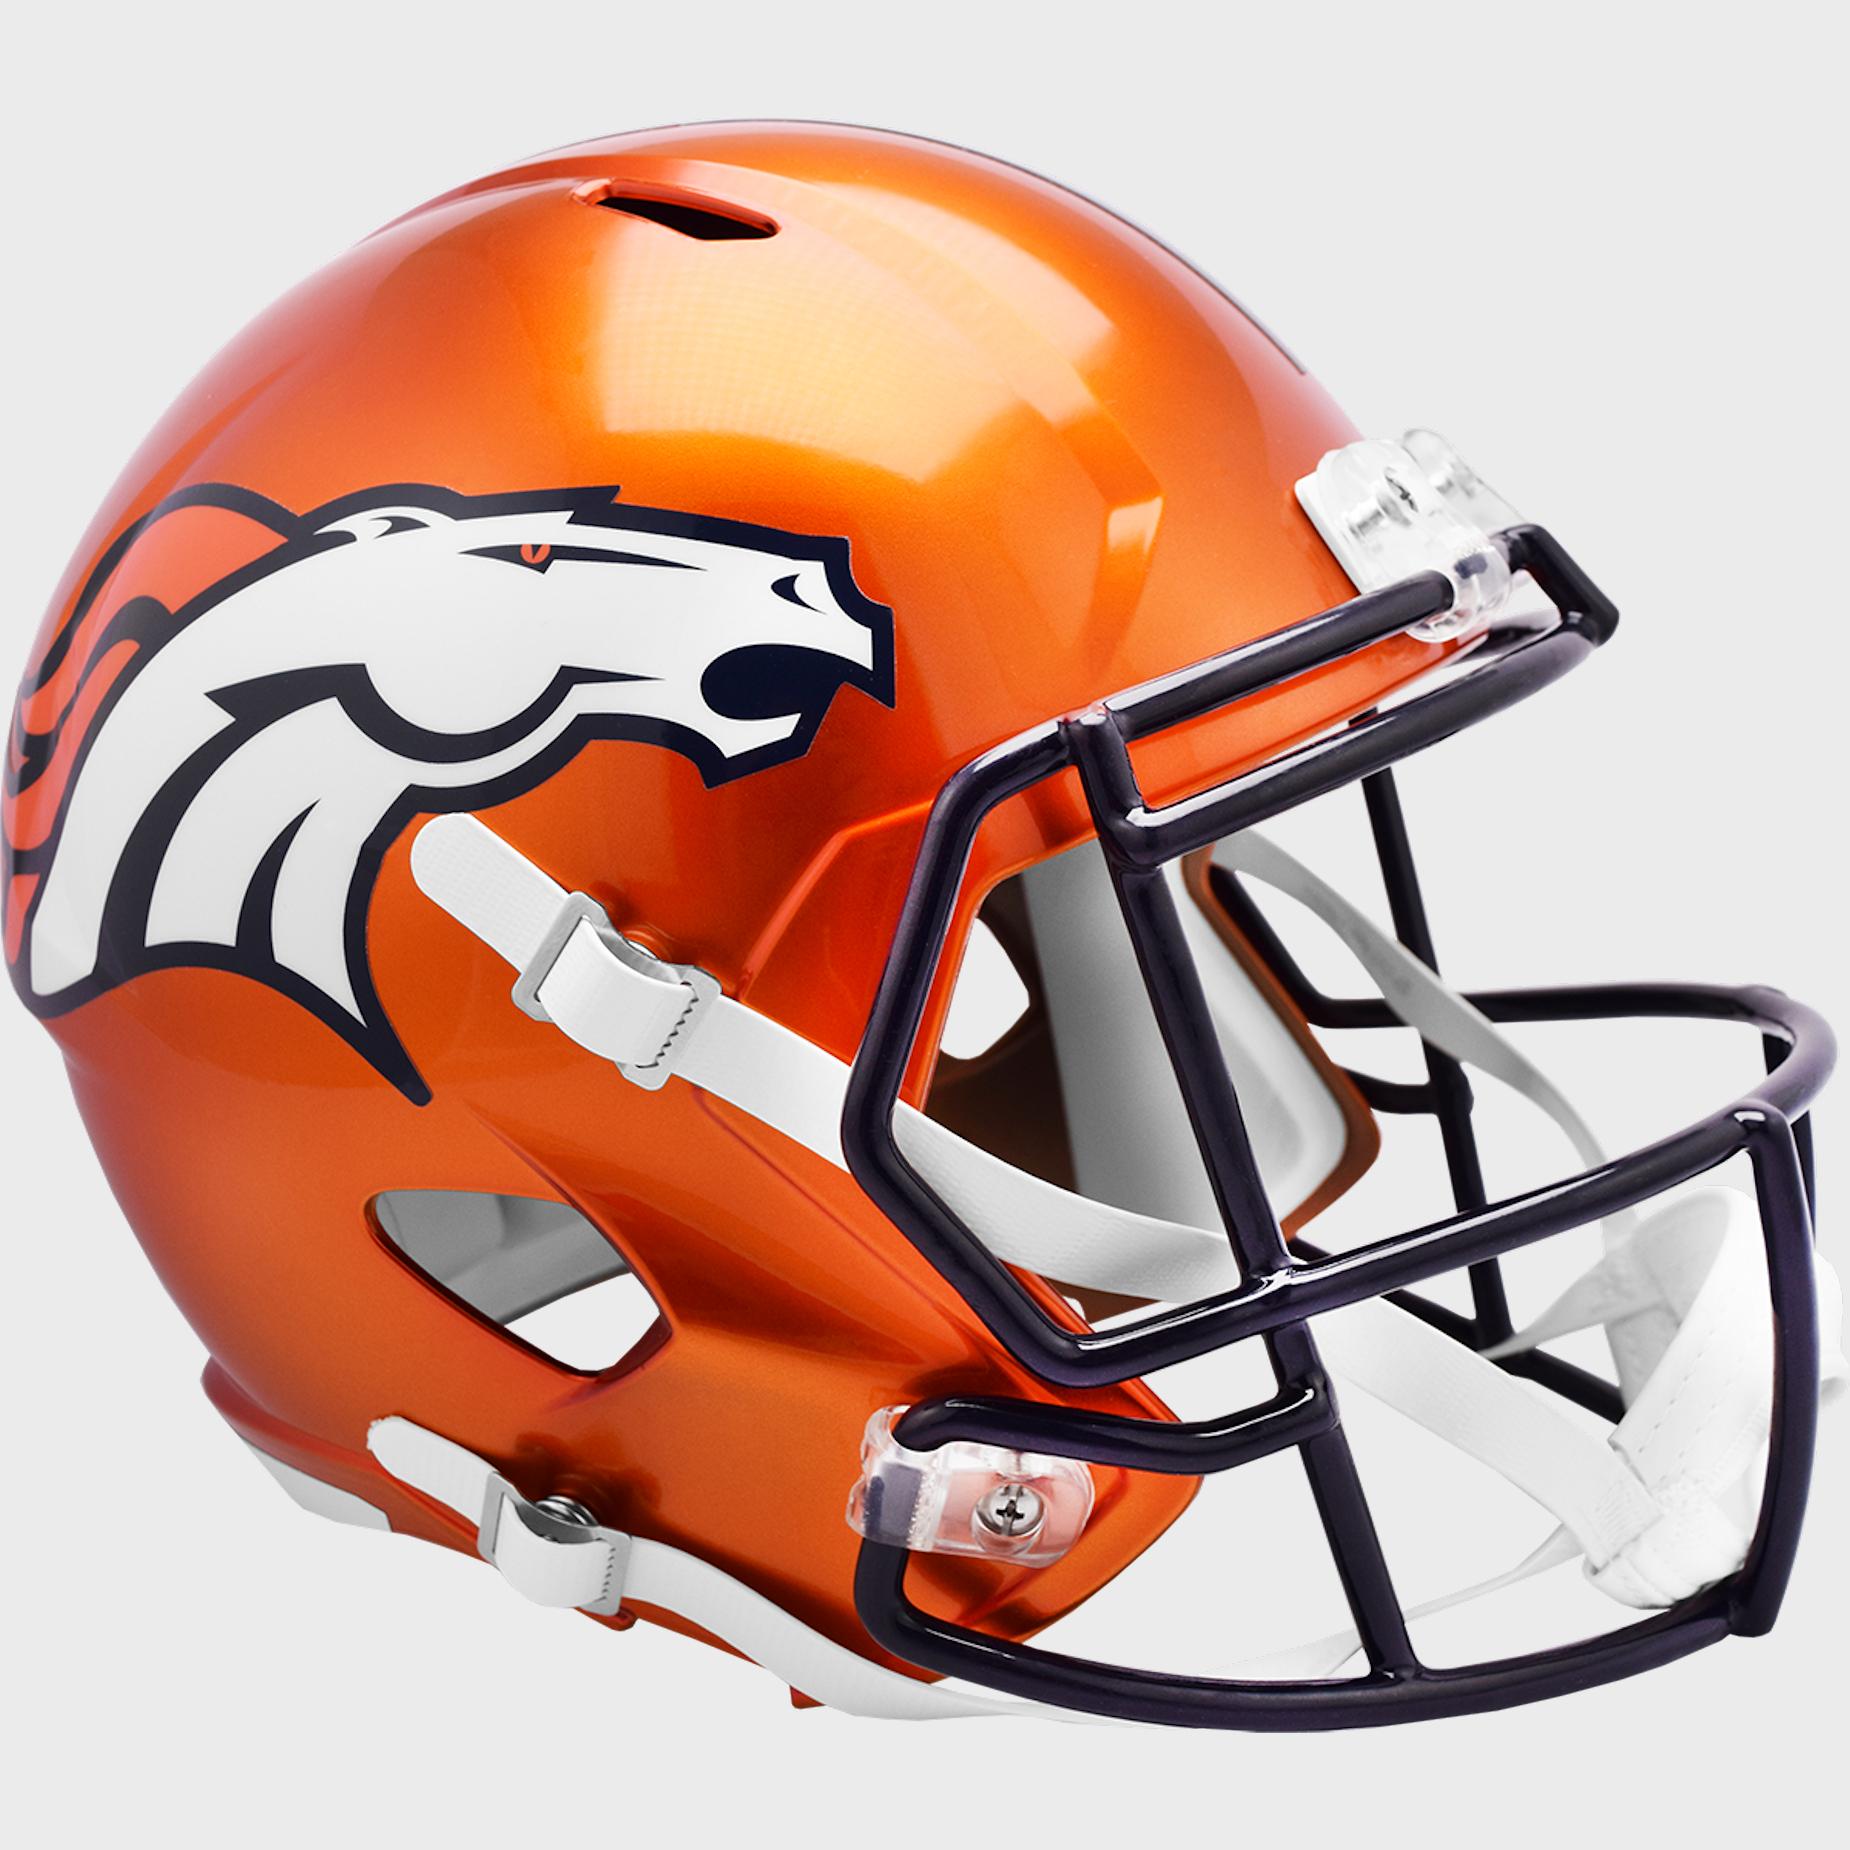 Denver Broncos Speed Replica Football Helmet <B>FLASH ESD 8/21/21</B>